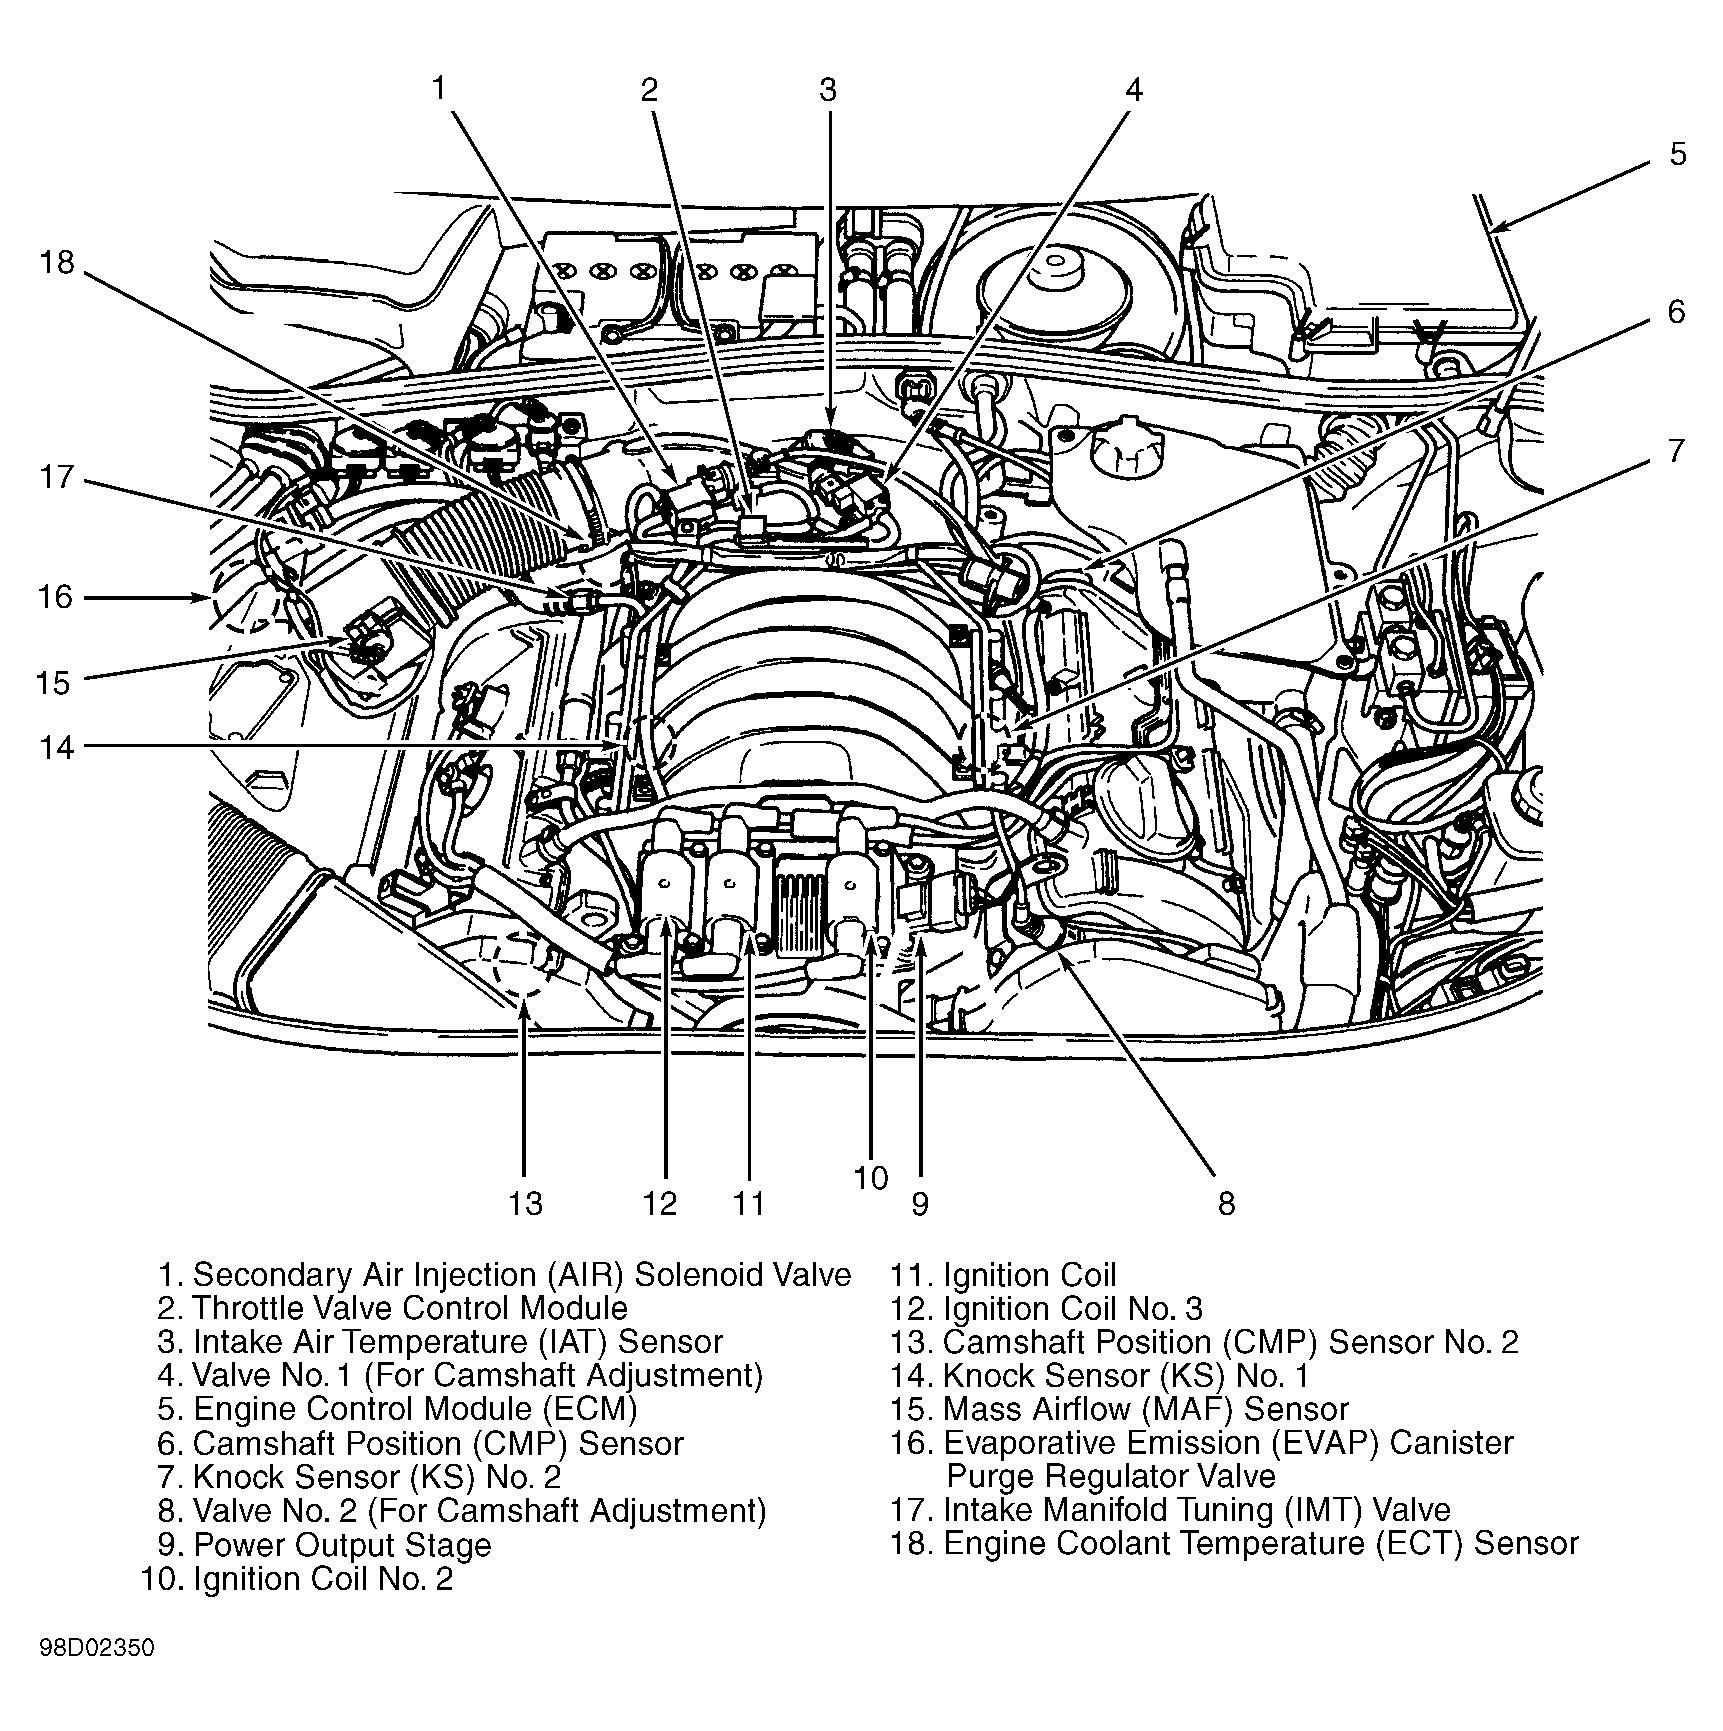 chrysler 3 5l engine diagram wiring diagram verified  labeled engine diagram for crysler #1